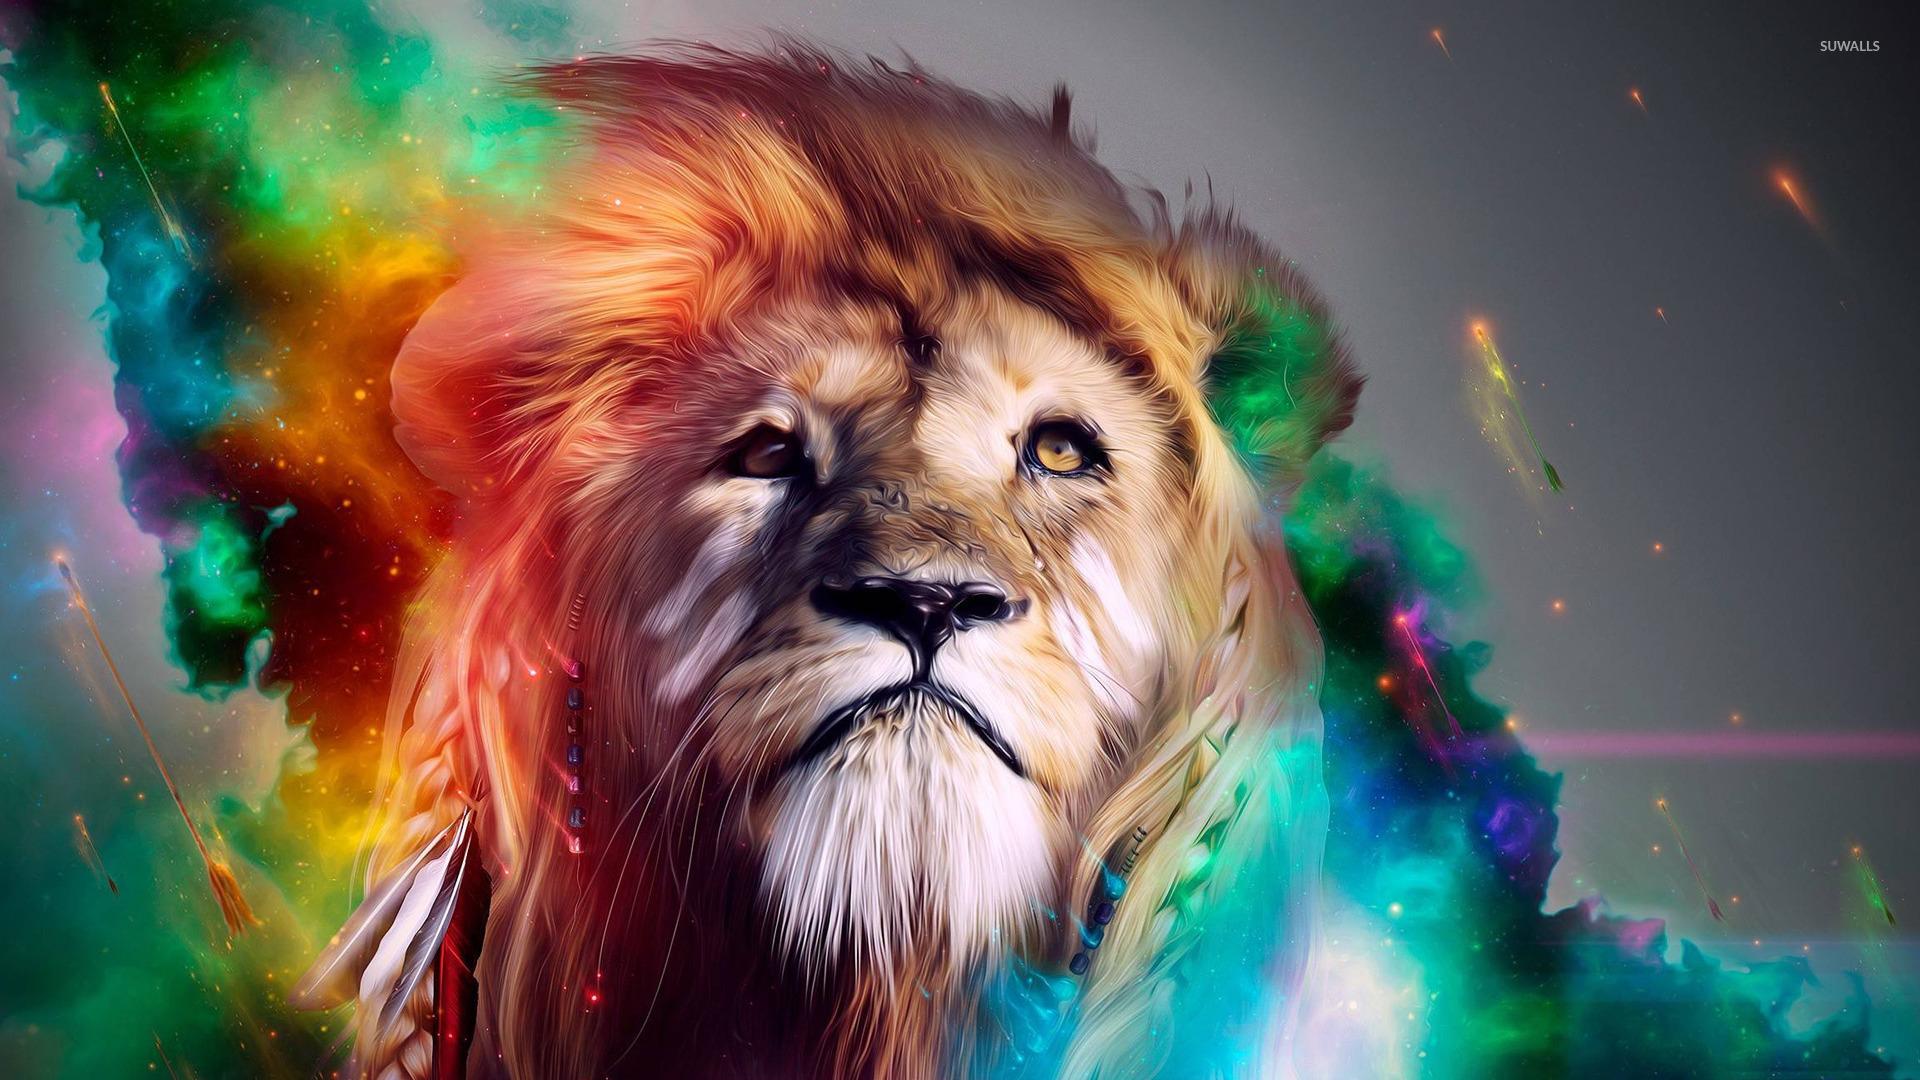 Colorful lion wallpaper   Digital Art wallpapers   15854 1920x1080